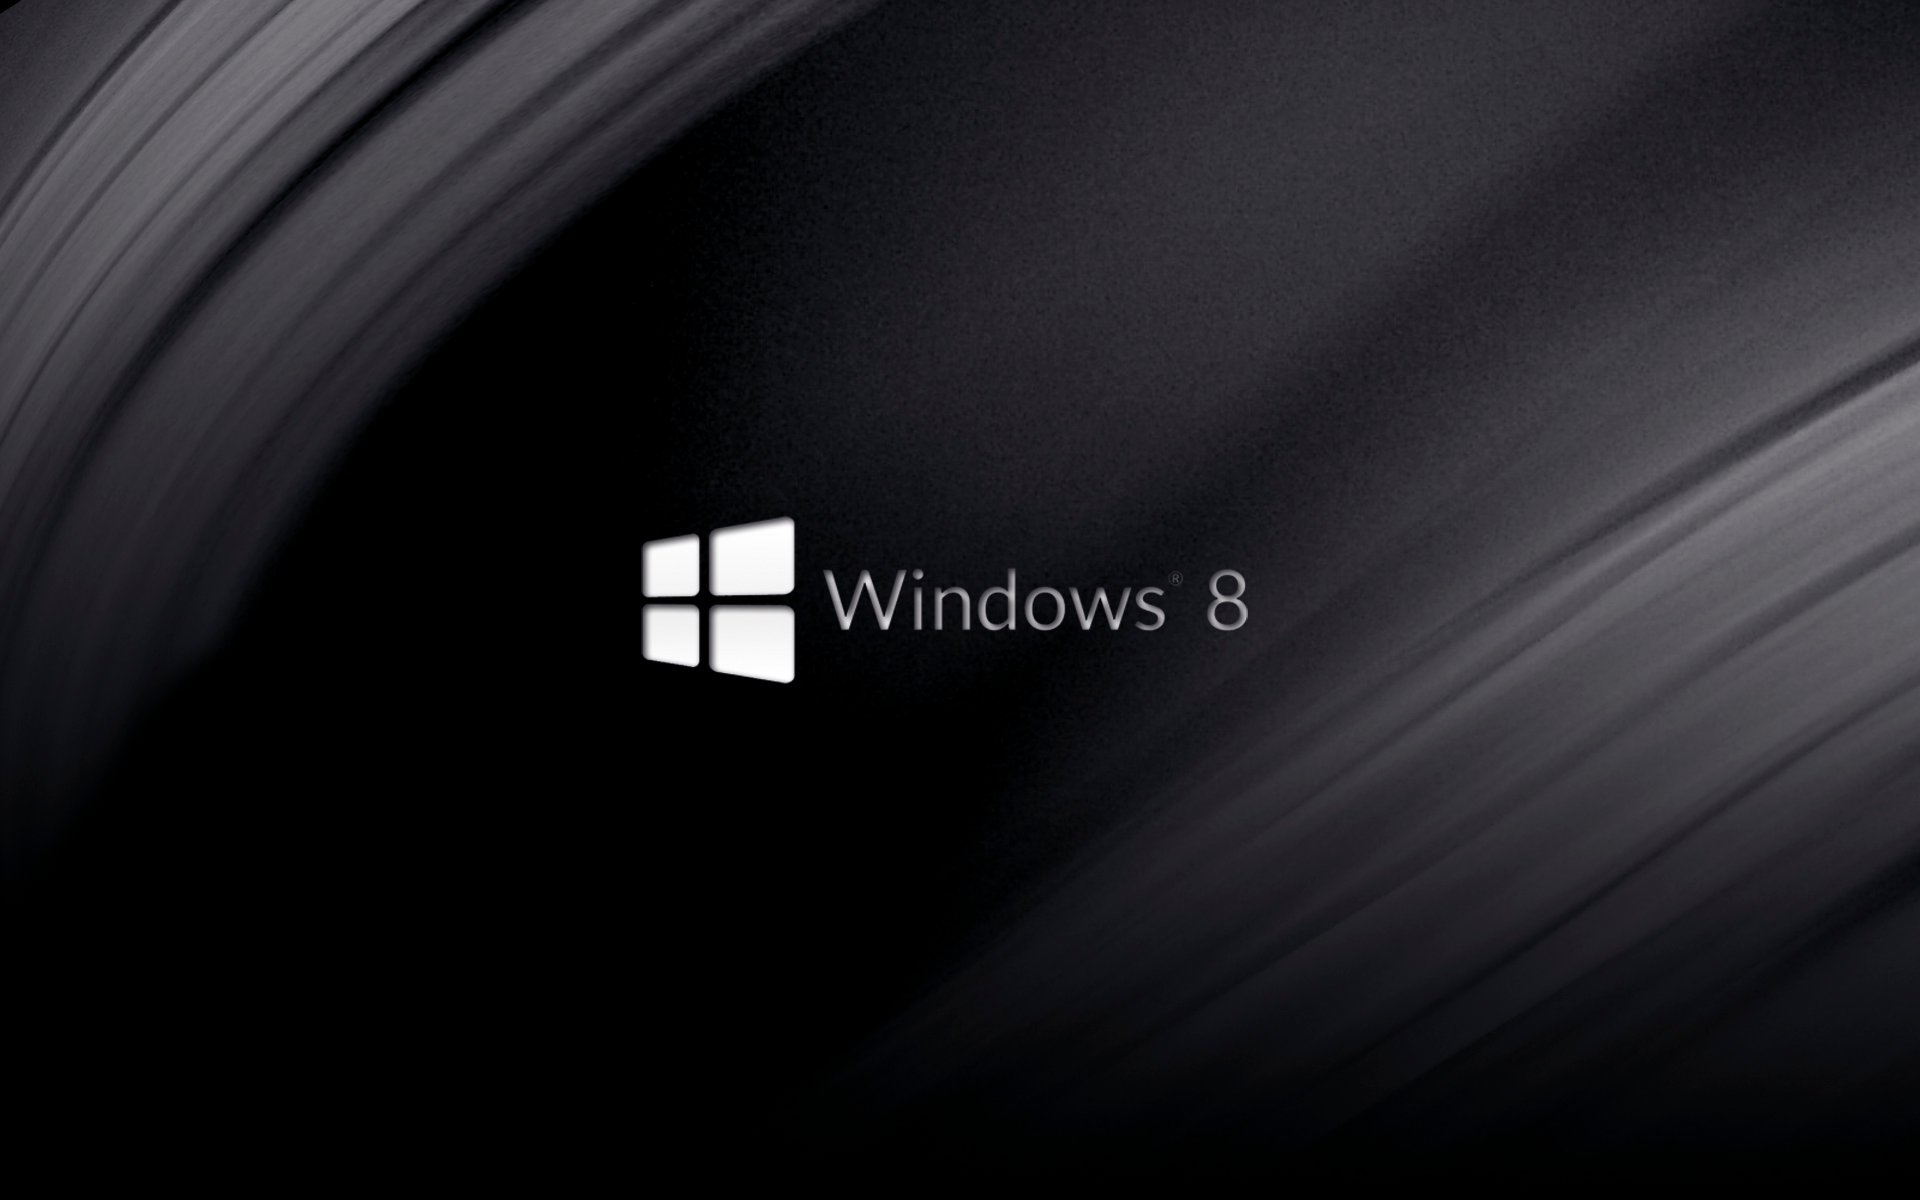 Minimal Black   Windows 8 Wallpaper by Wingweaver666 1920x1200